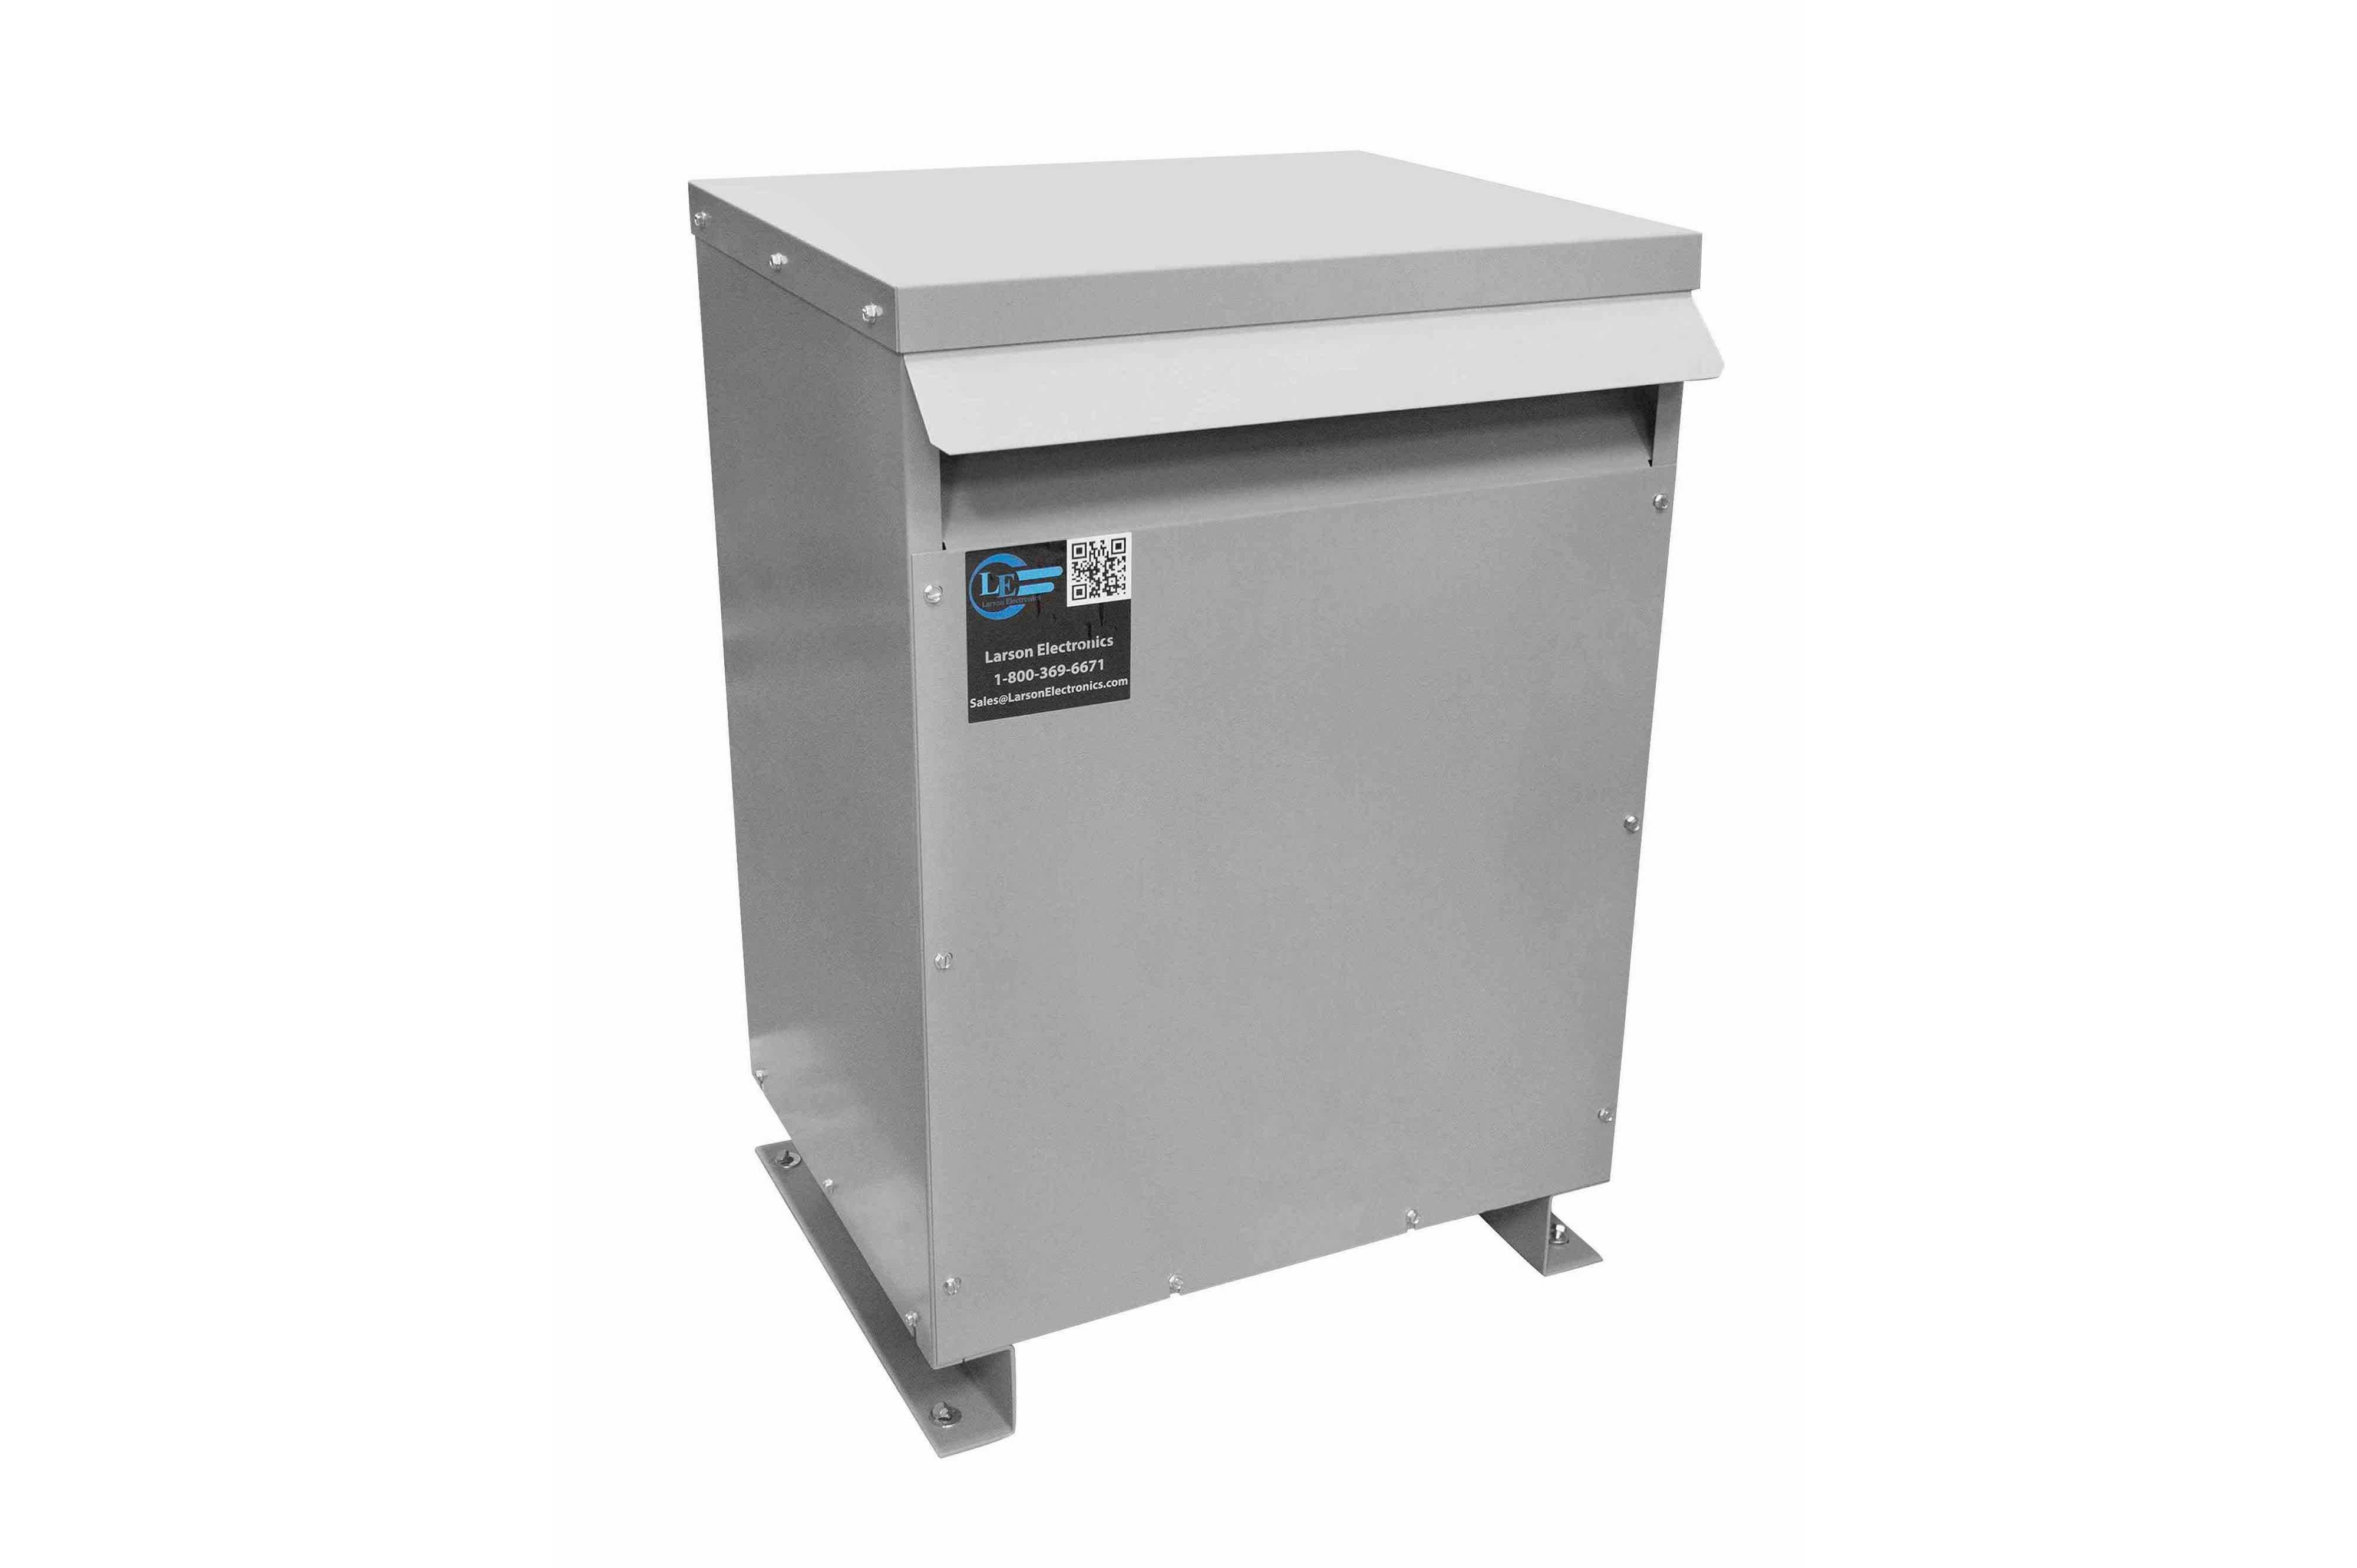 900 kVA 3PH Isolation Transformer, 400V Wye Primary, 208V Delta Secondary, N3R, Ventilated, 60 Hz